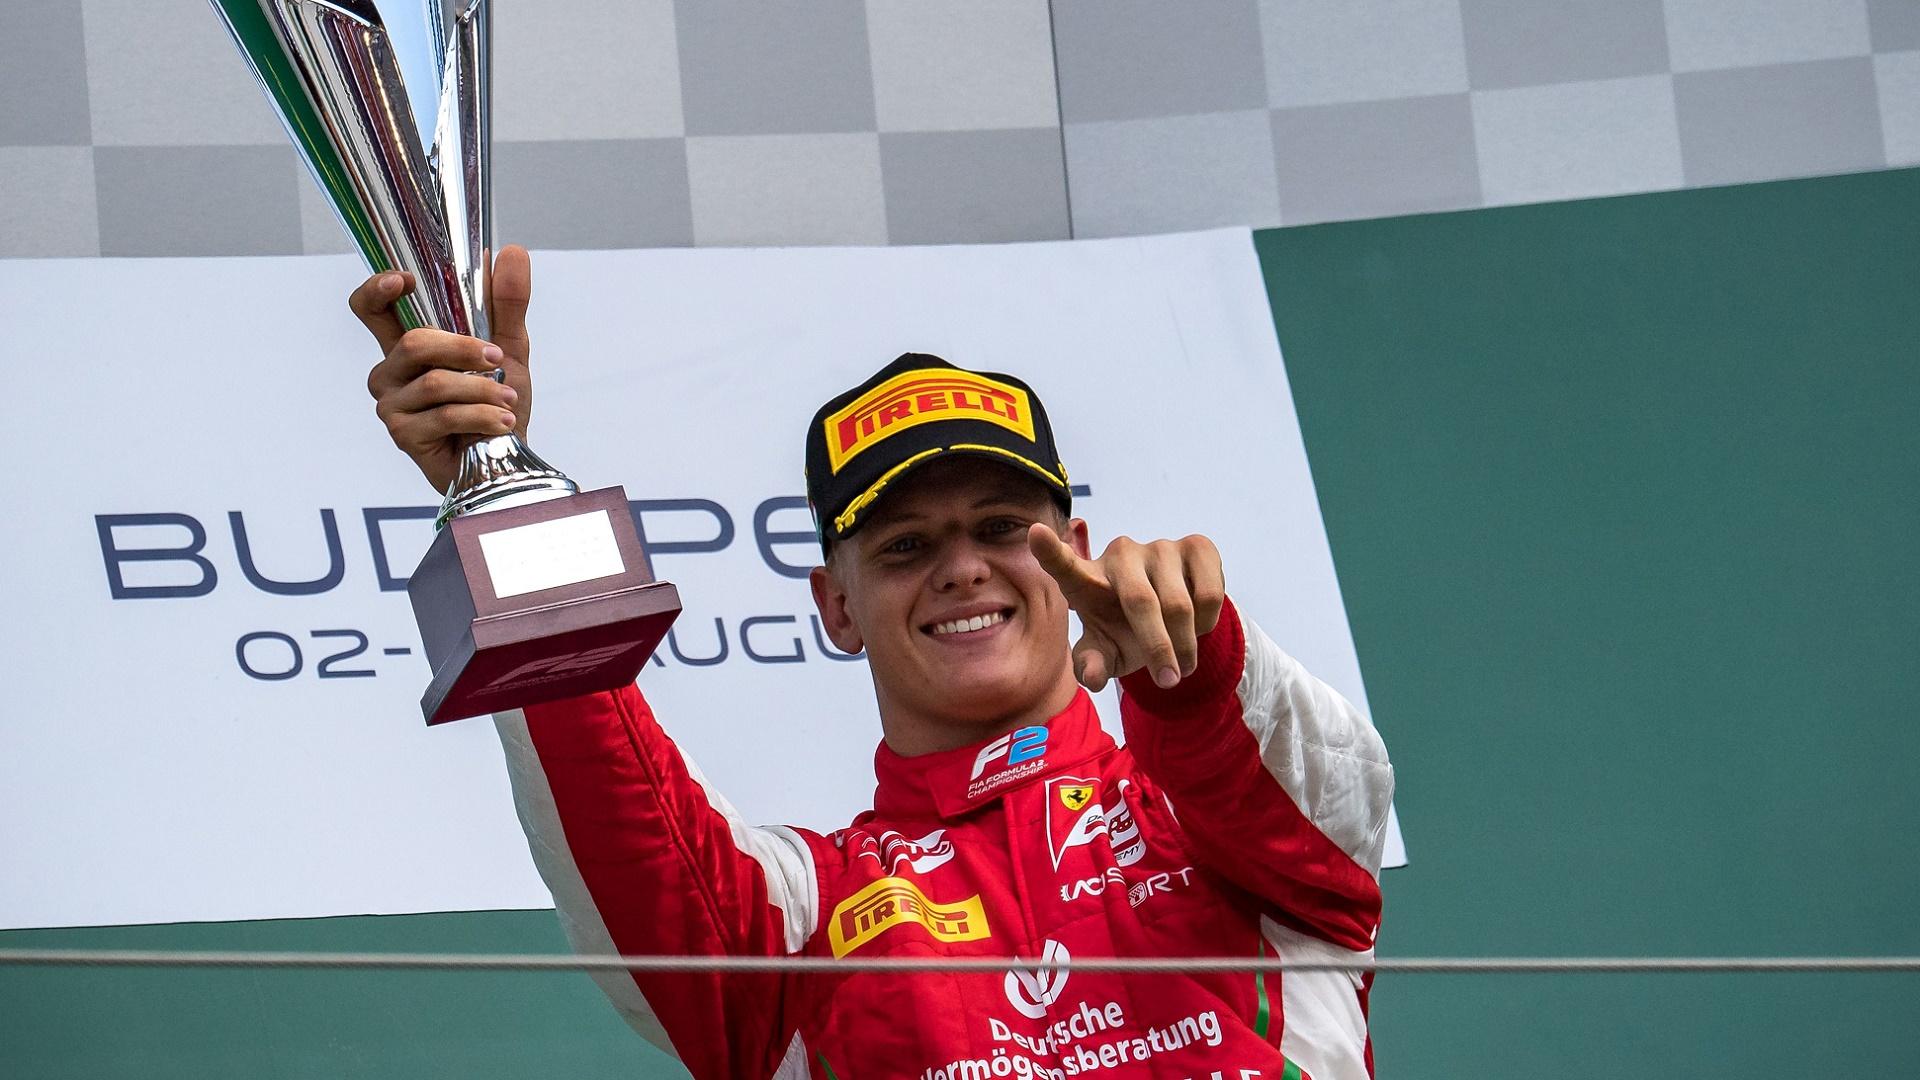 2020-12-02 Mick Schumacher F1 Formula 1